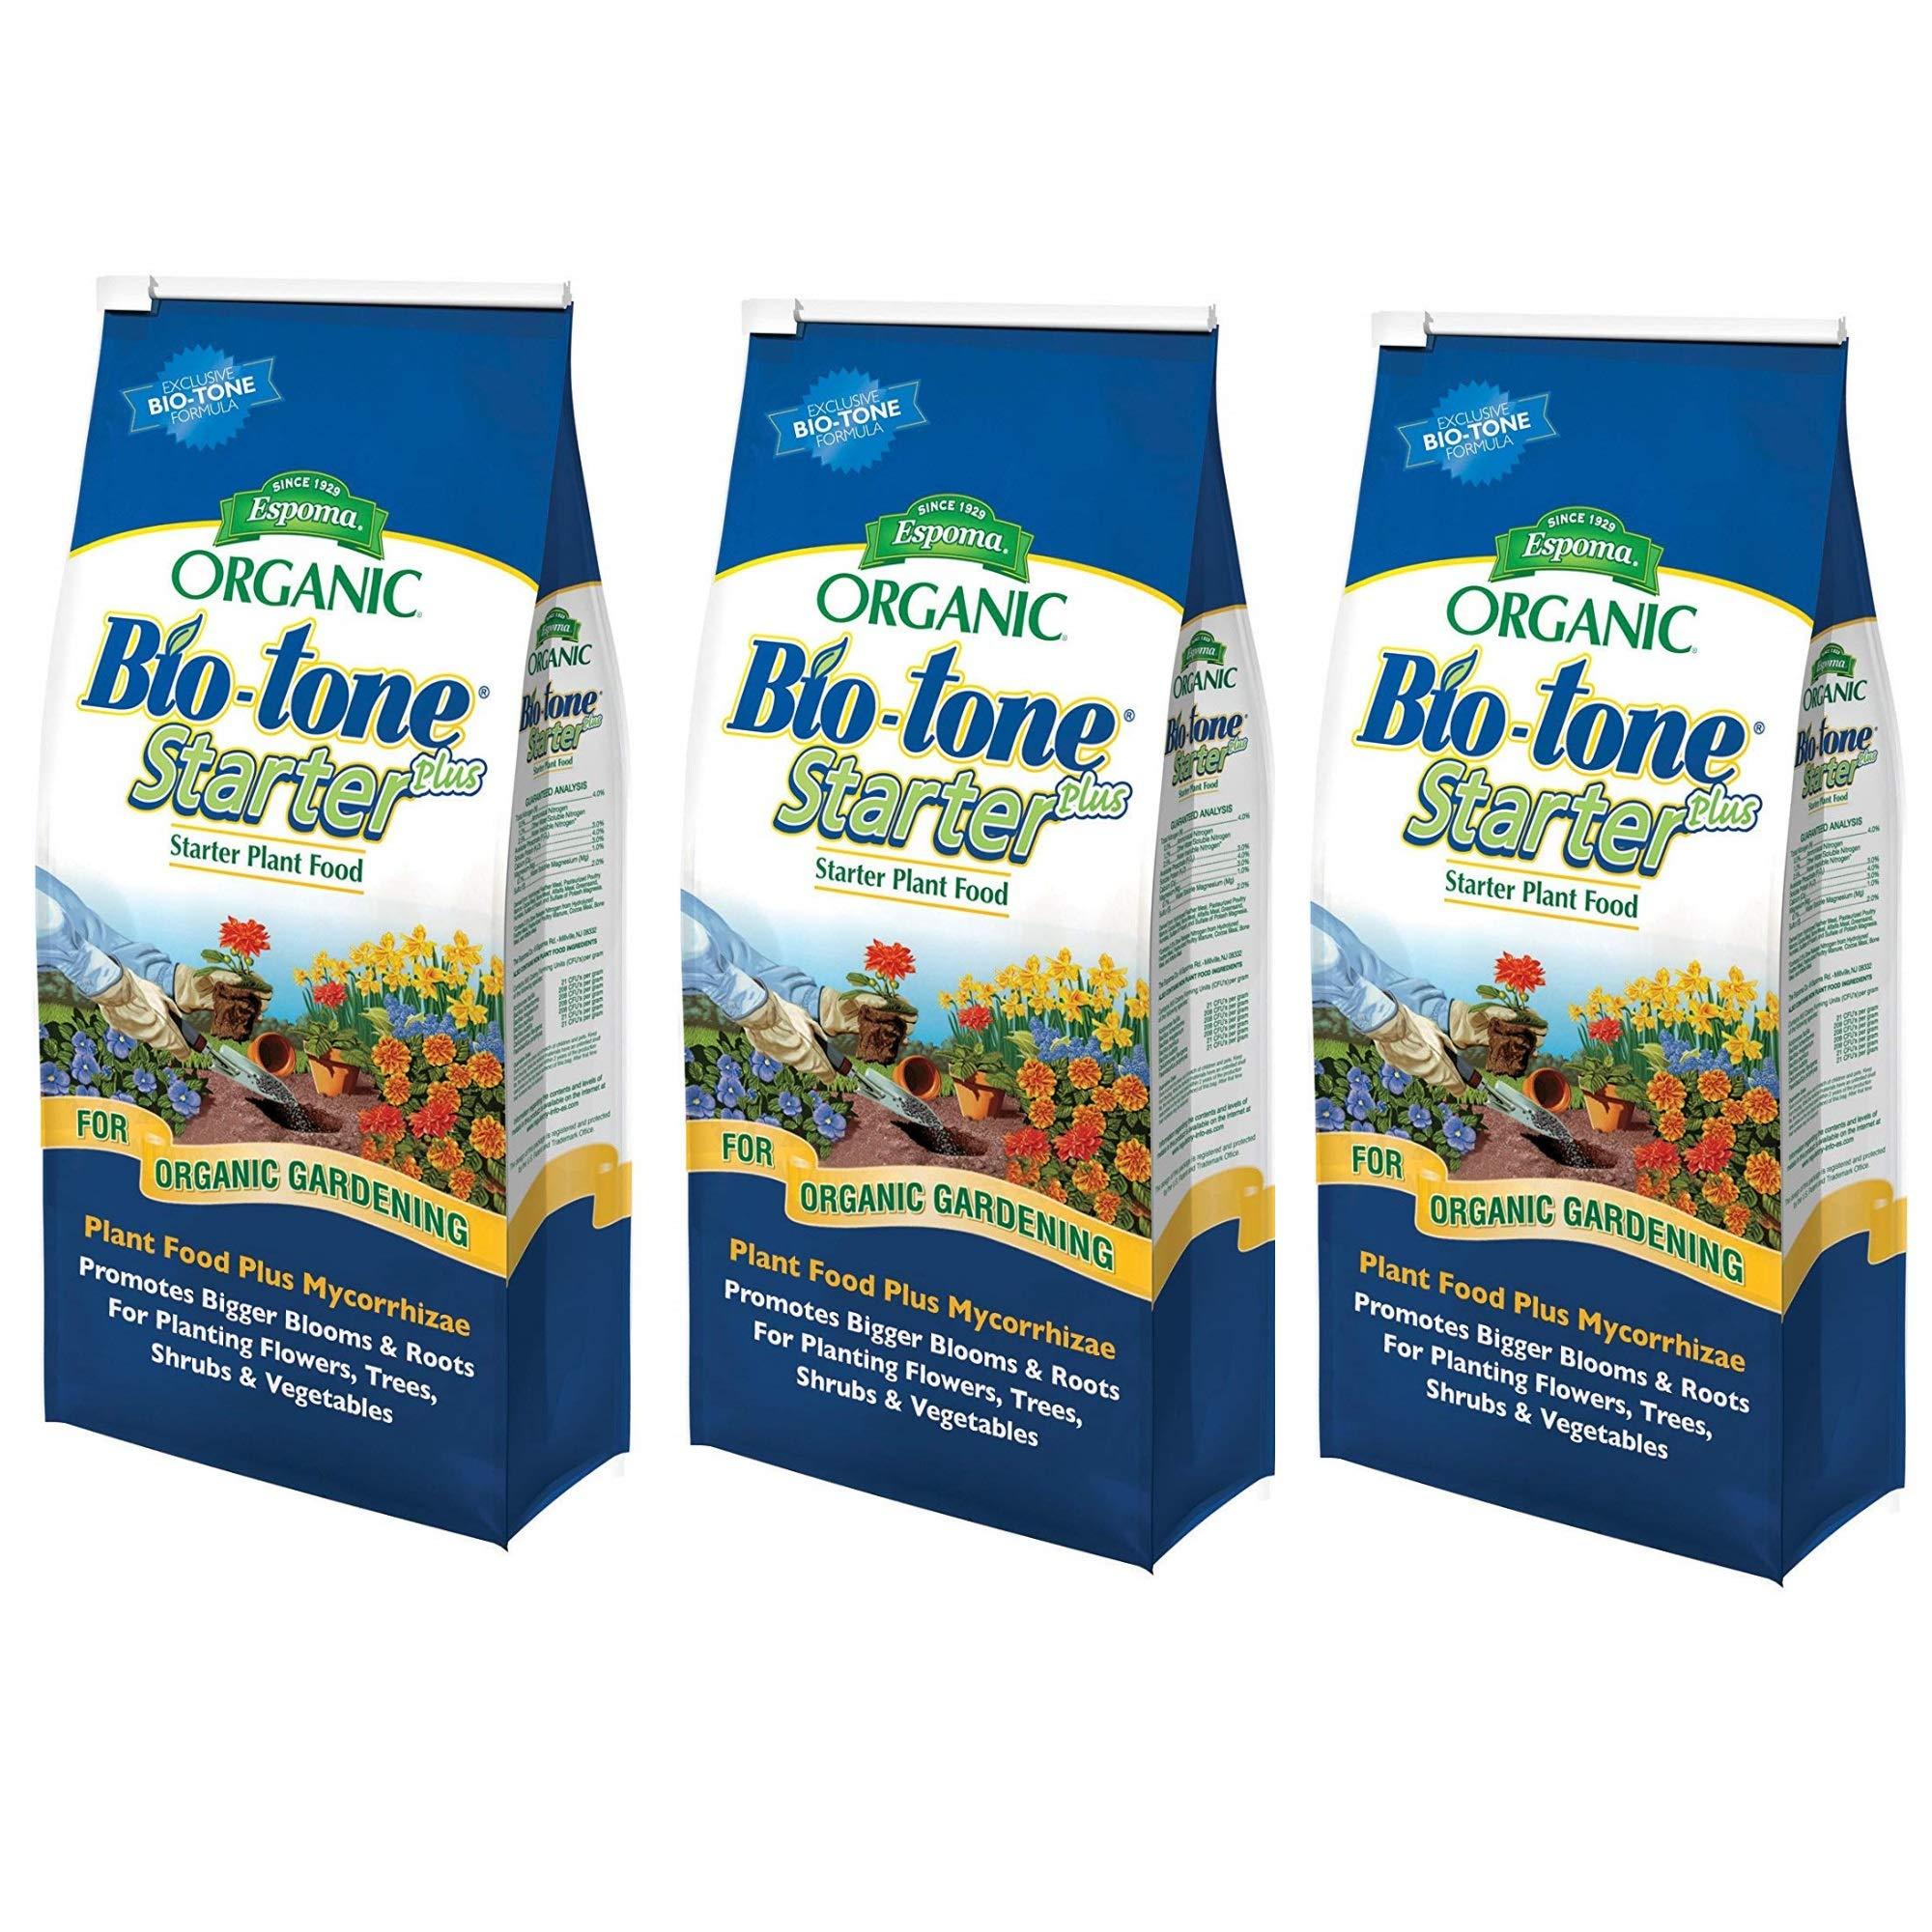 Espoma Organic Bio-Tone Starter Plus All Natural Plant Food - 4 lb Bag BTS4, 3 Pack by Espoma